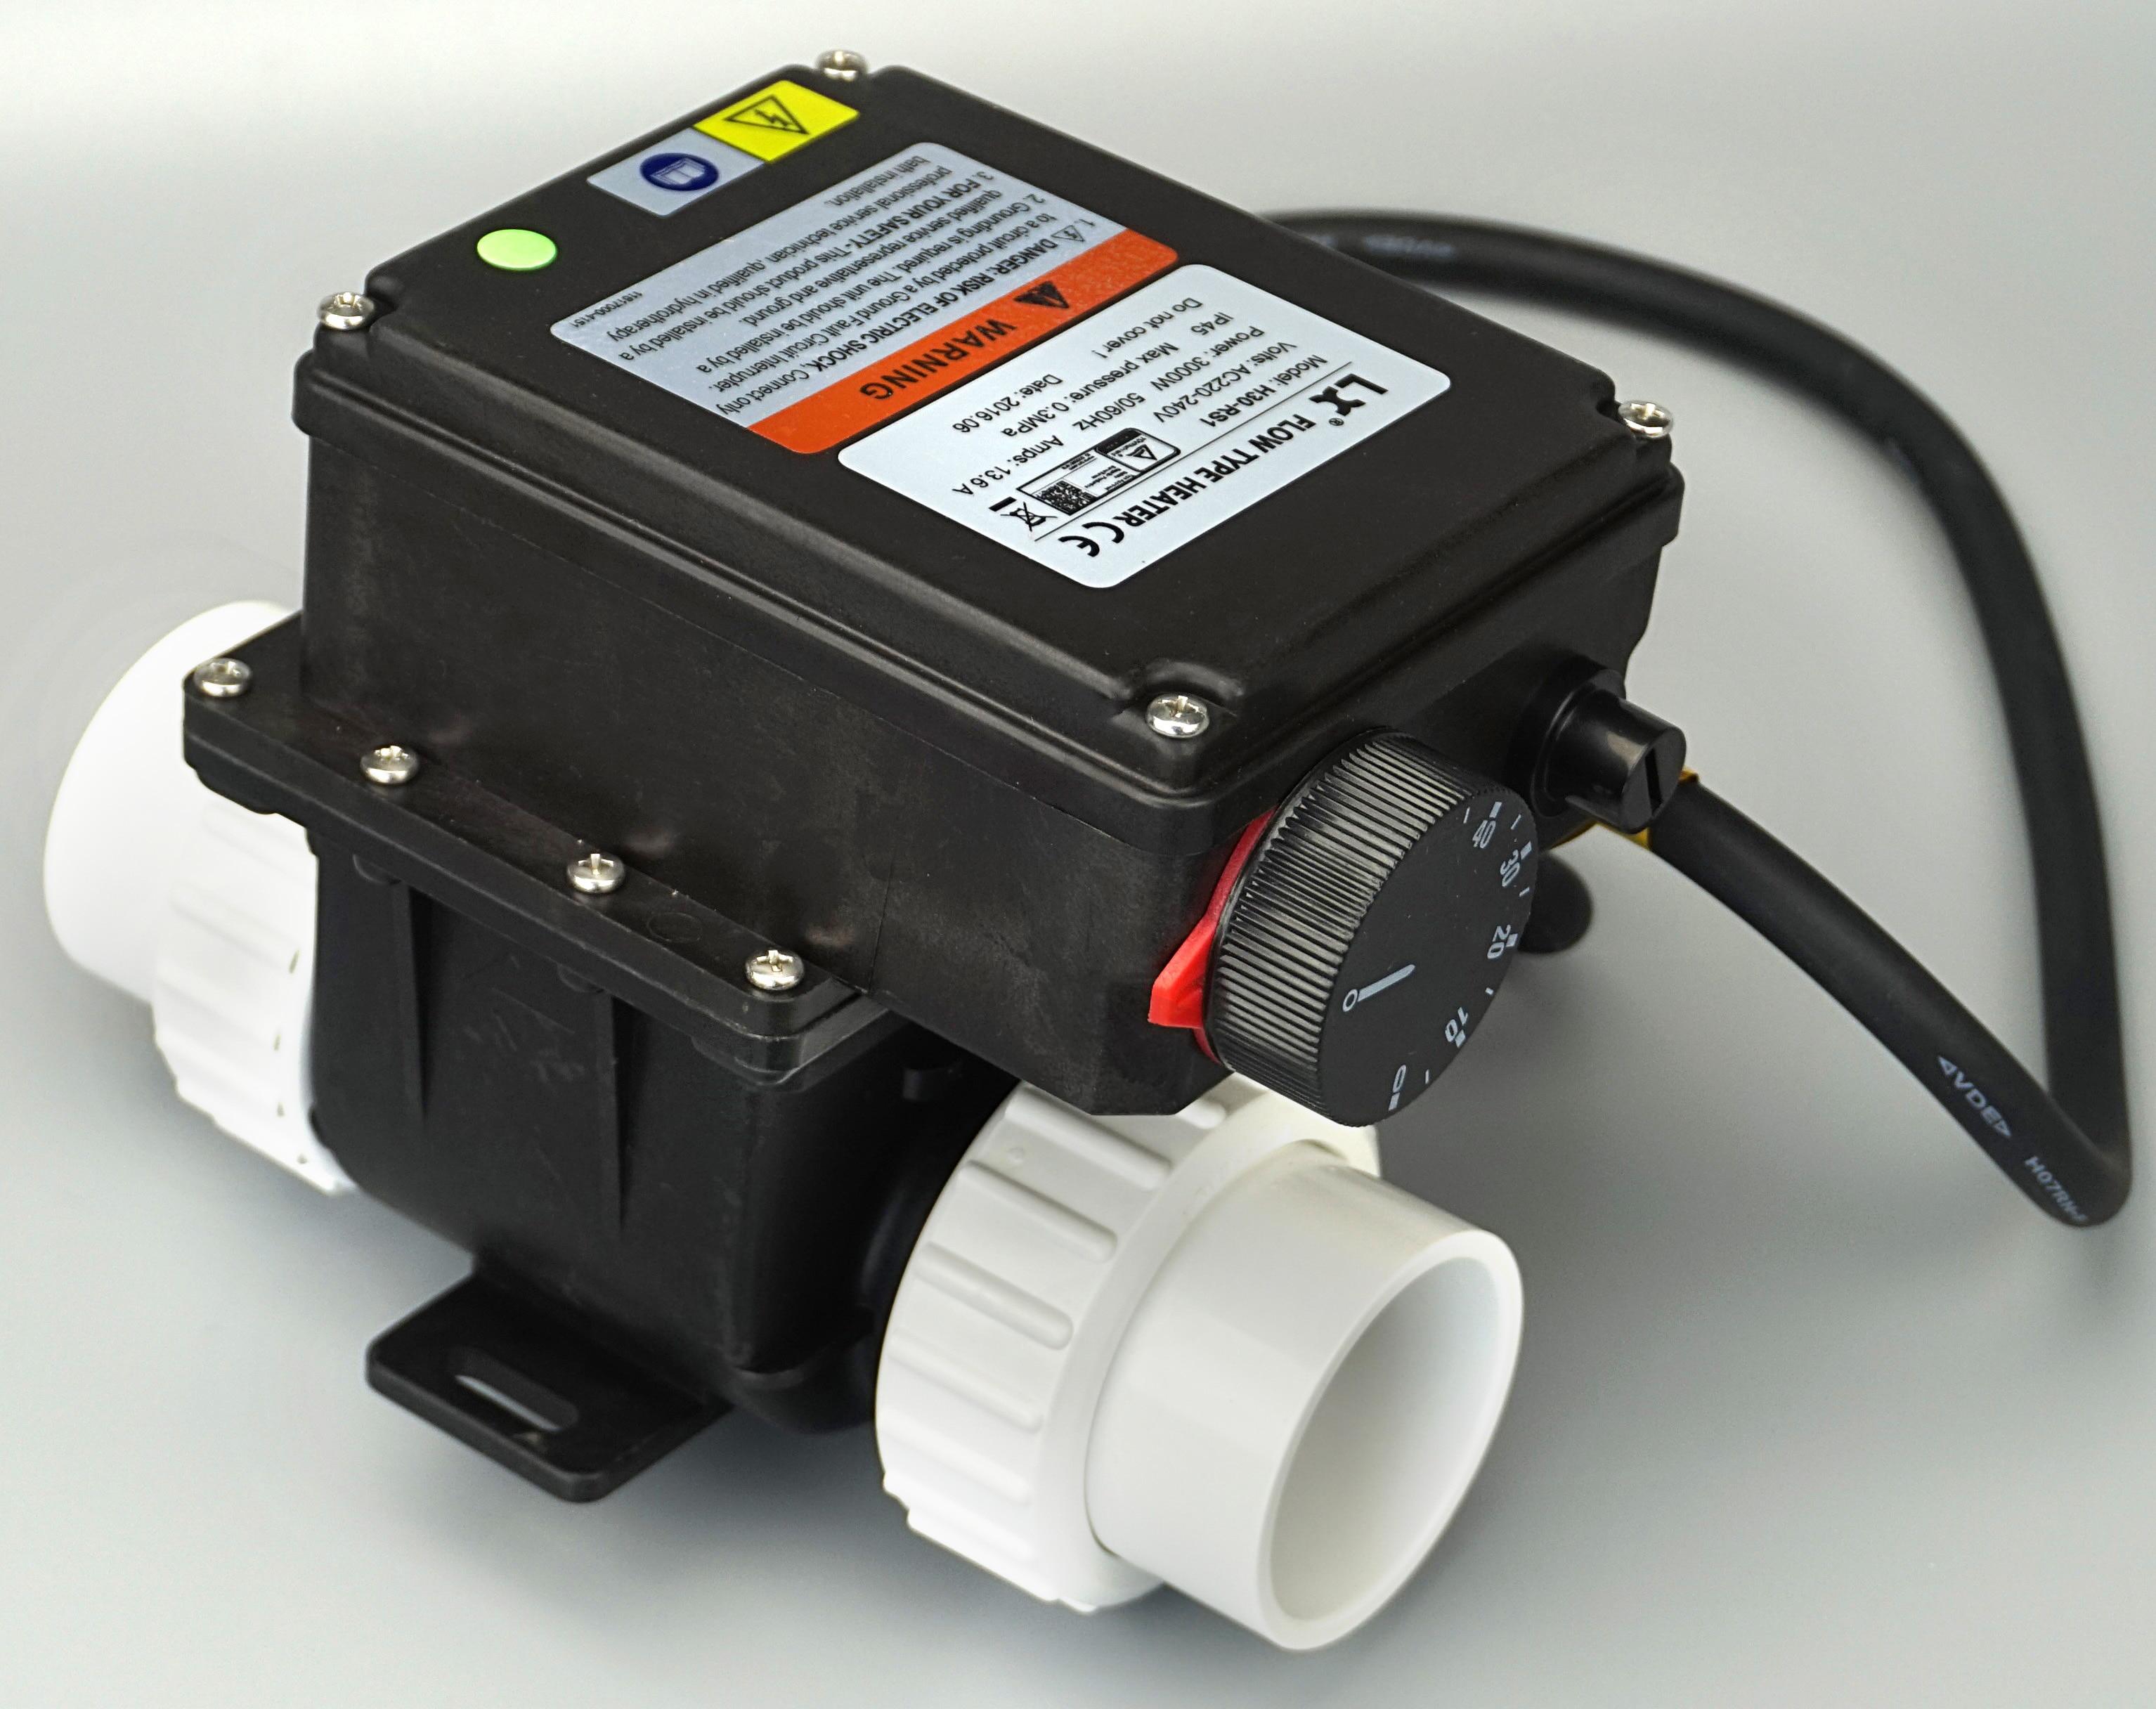 China LX H30 RS1 3kw Elektro Spa Heizung Mit Temperaturregler Für Badewanne  U0026 Whirlpool Spa Pool 3000 Watt Wasser Heizung In China LX H30 RS1 3kw  Elektro ...